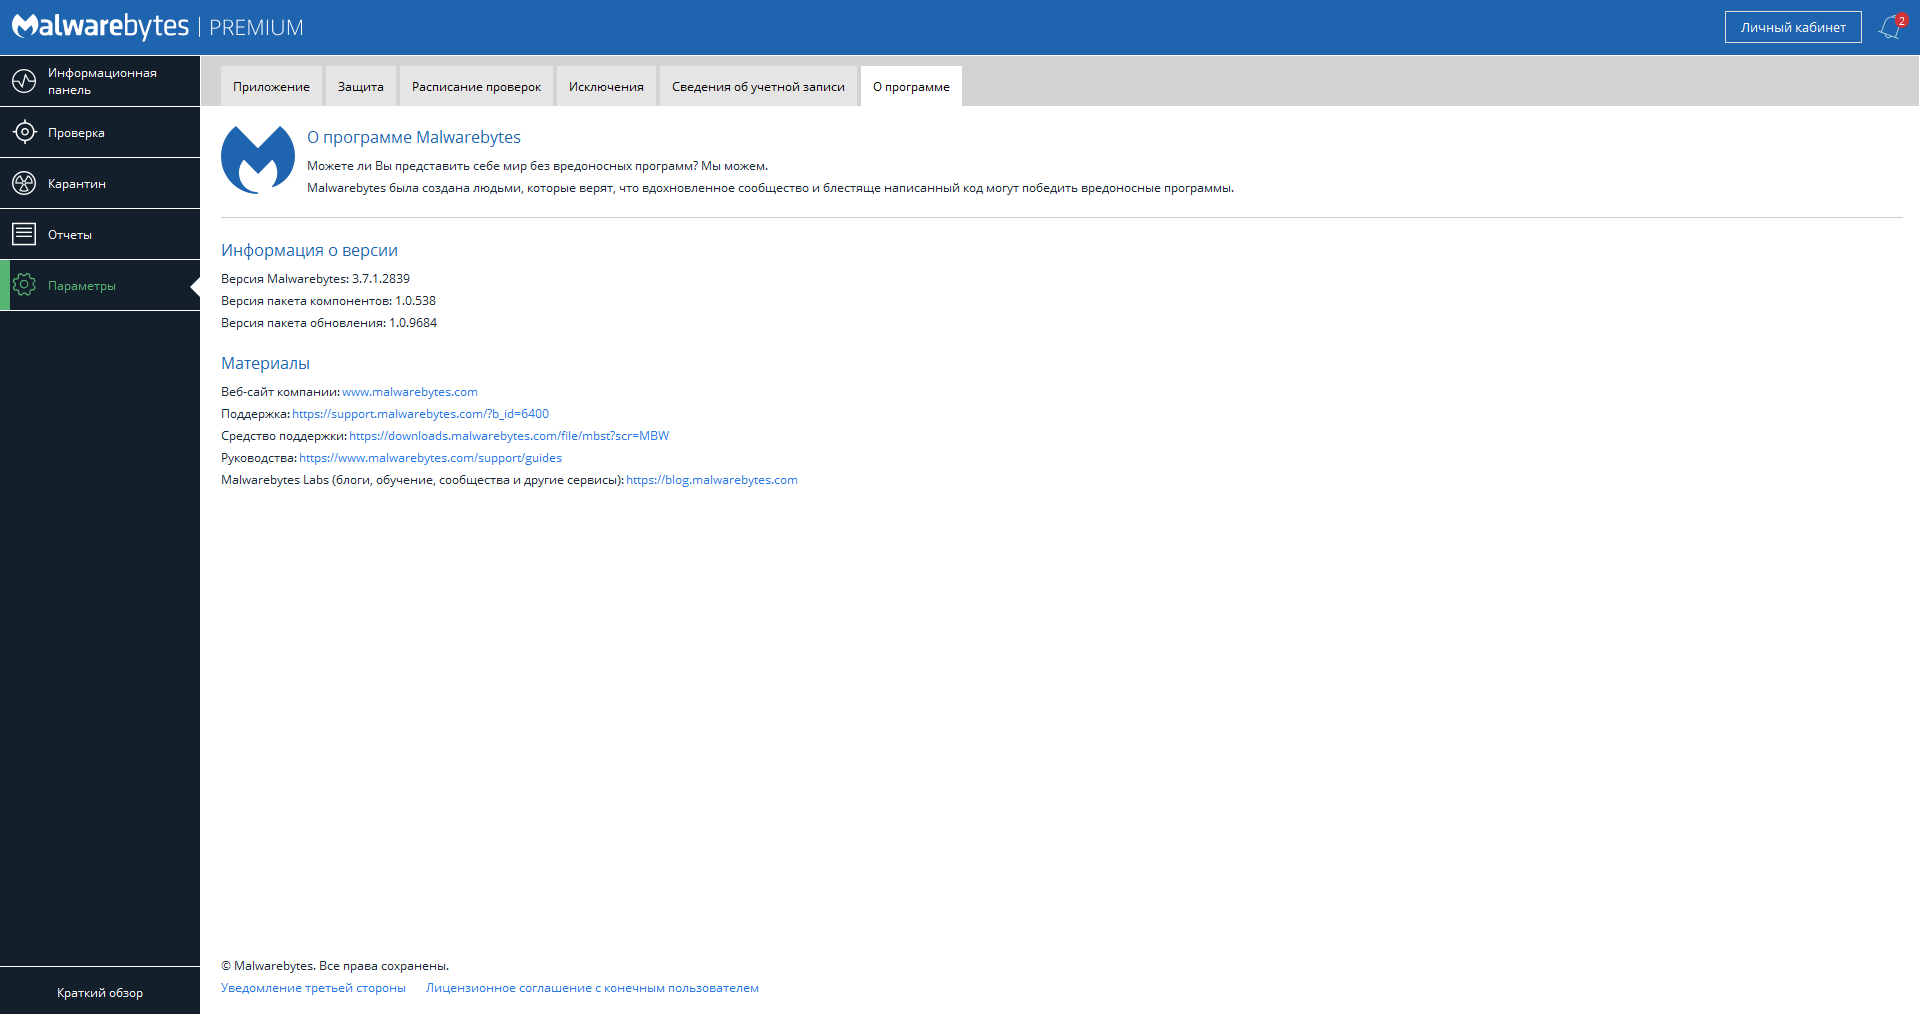 malwarebytes antimalware at http //www.malwarebytes.org/products/malwarebytes_free/